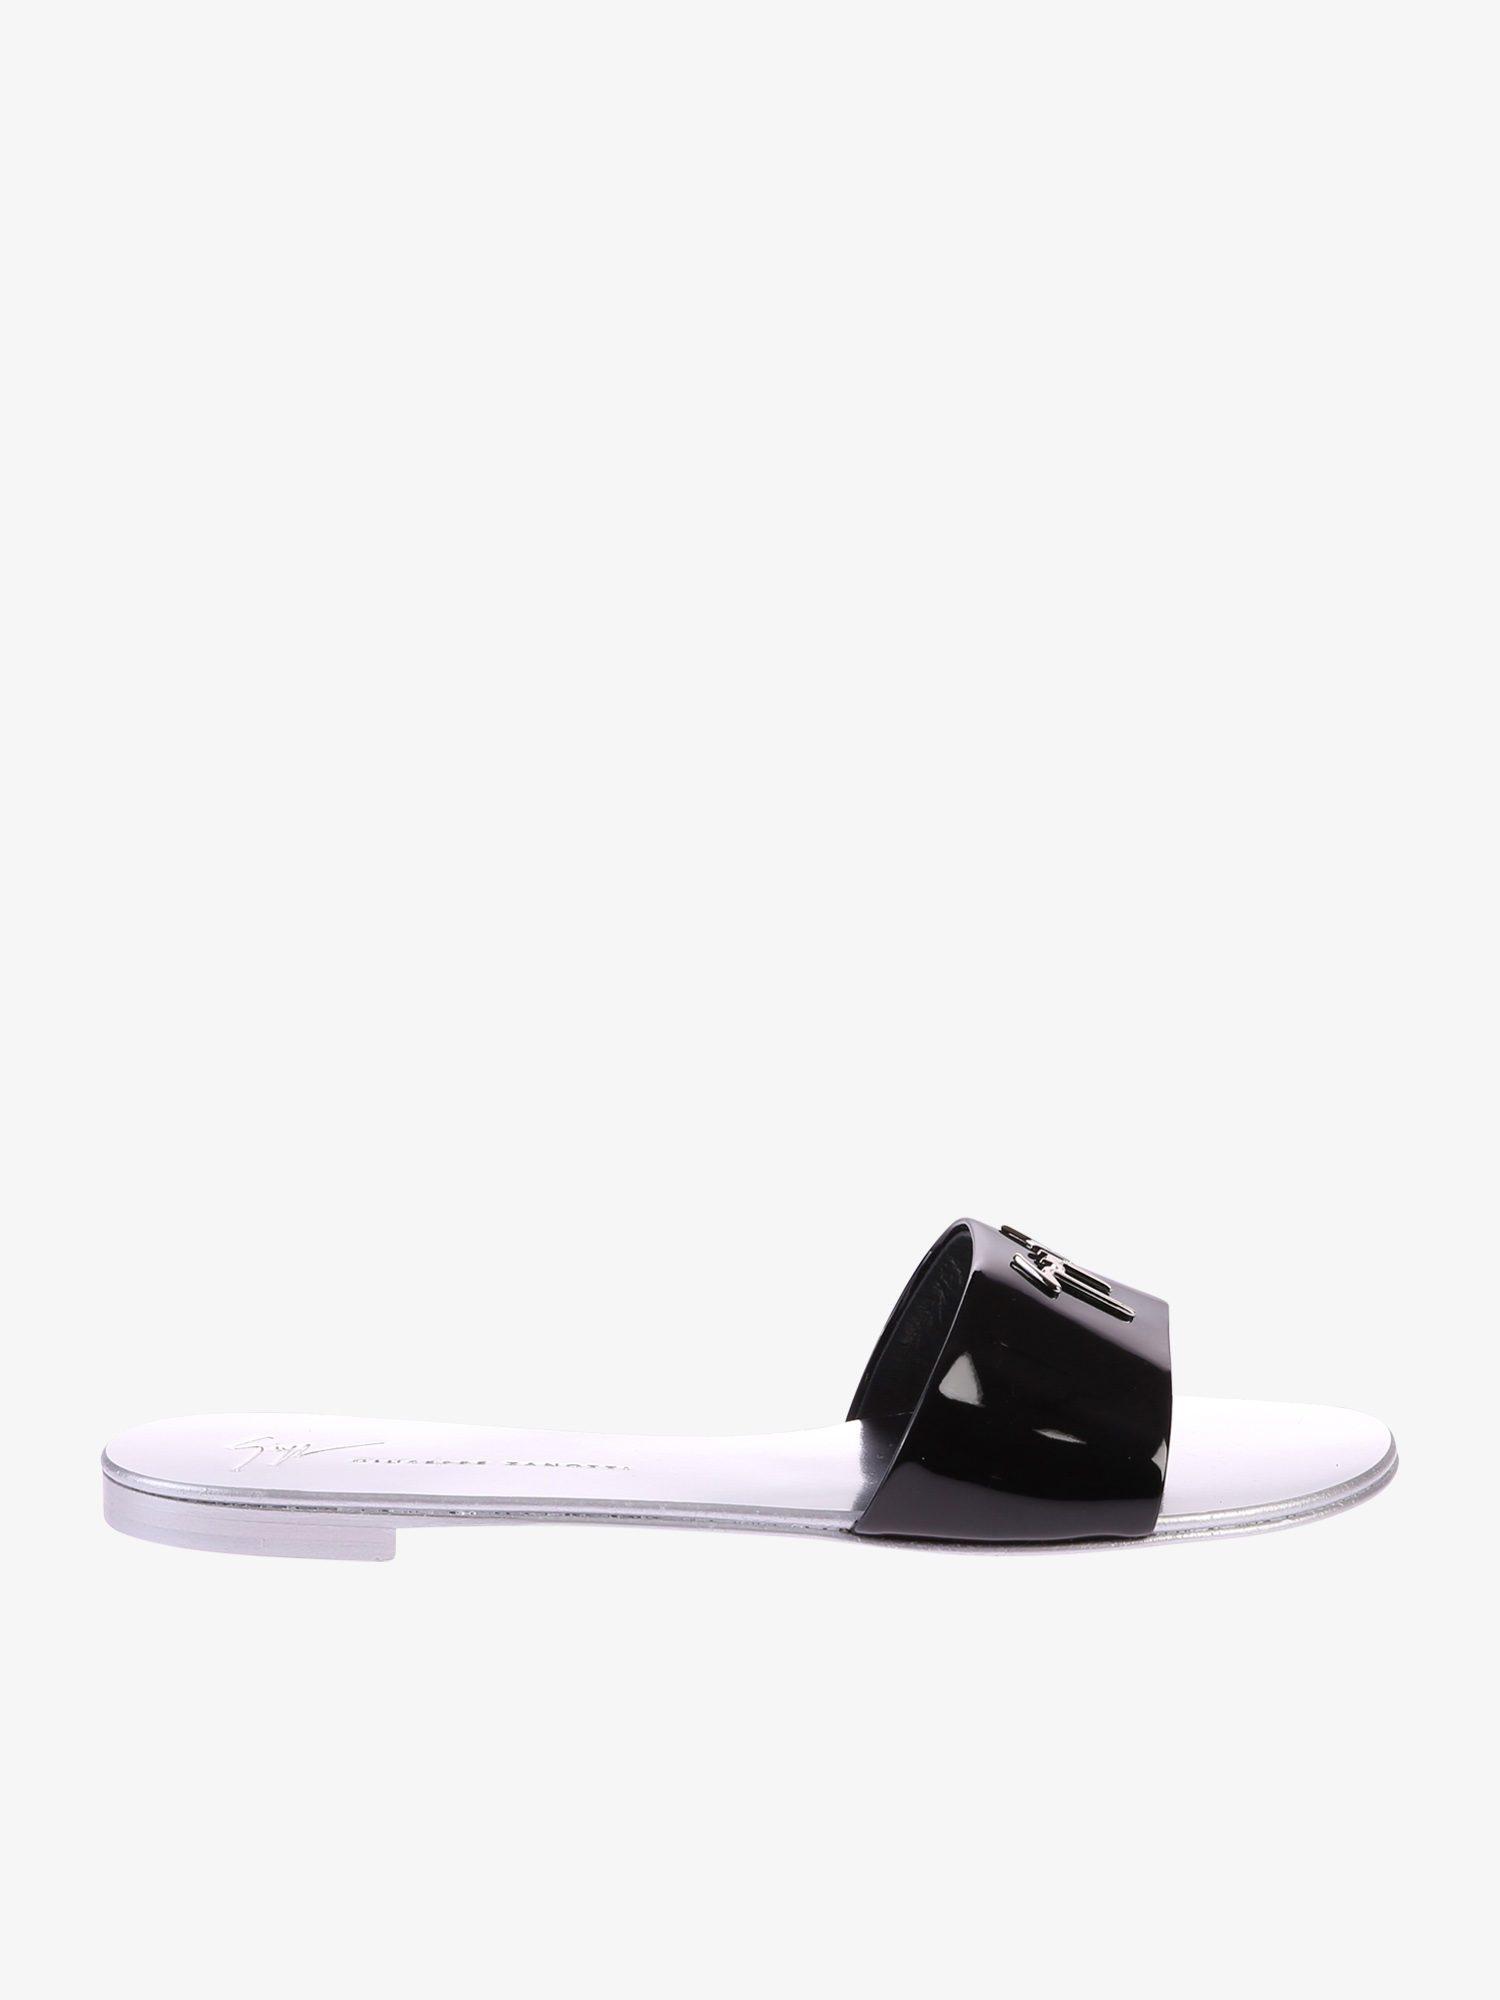 45e11ce99313 Lyst - Giuseppe Zanotti Patent Leather Sandals in Black - Save 30%